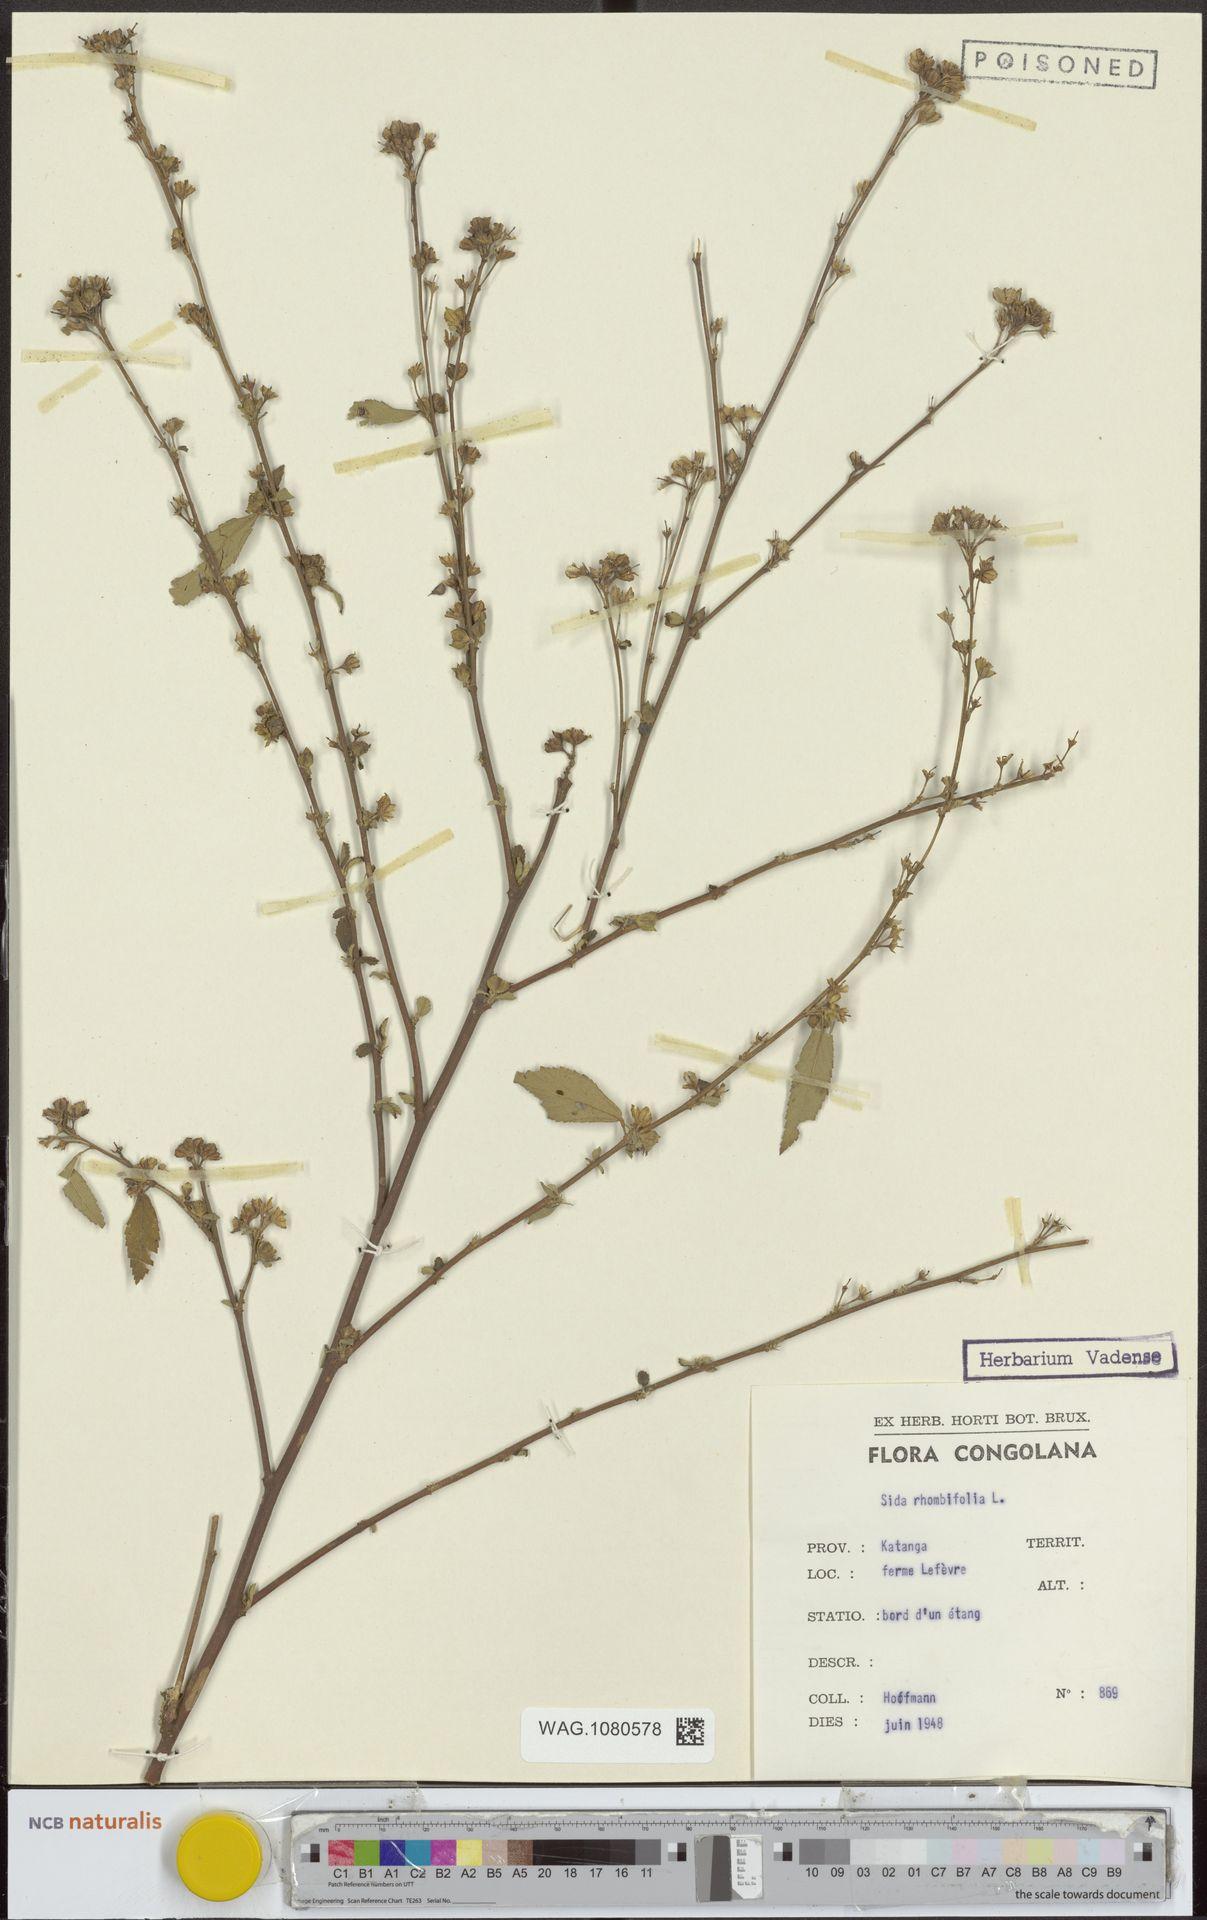 WAG.1080578   Sida rhombifolia L.